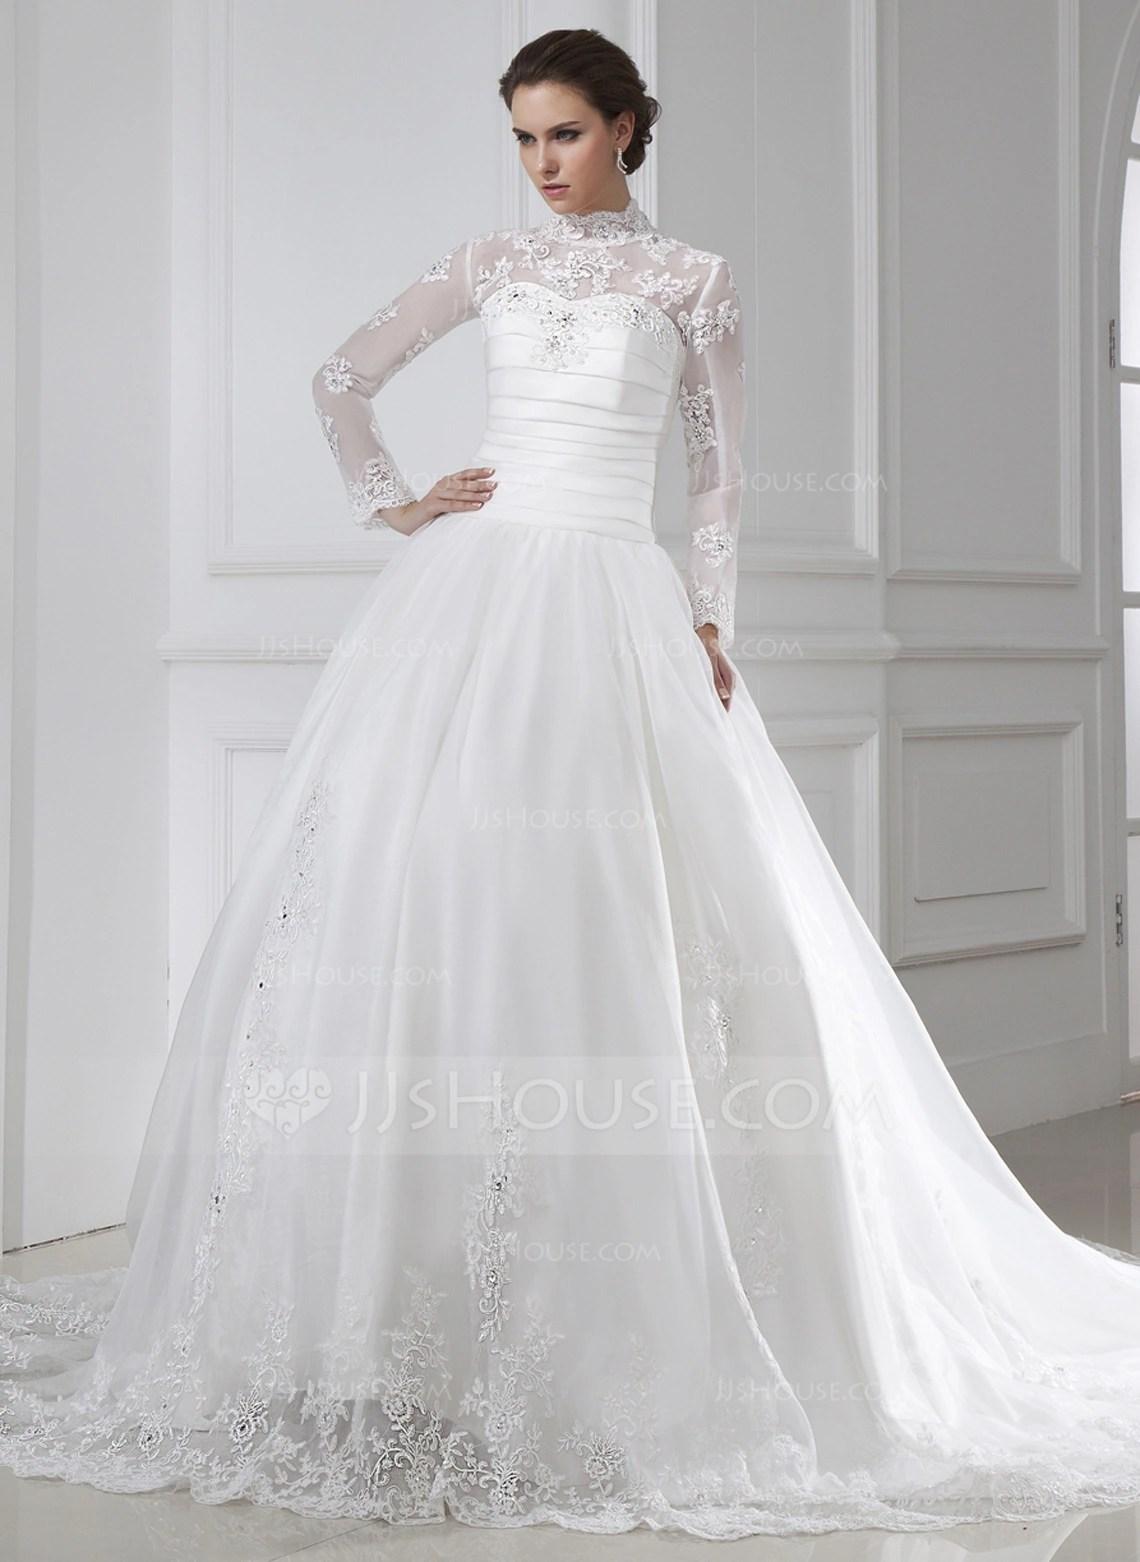 Ball Gown High Neck Chapel Train Organza Wedding Dress With Ruffle Lace Beading g jjshouse wedding dress Home Wedding Dresses Loading zoom